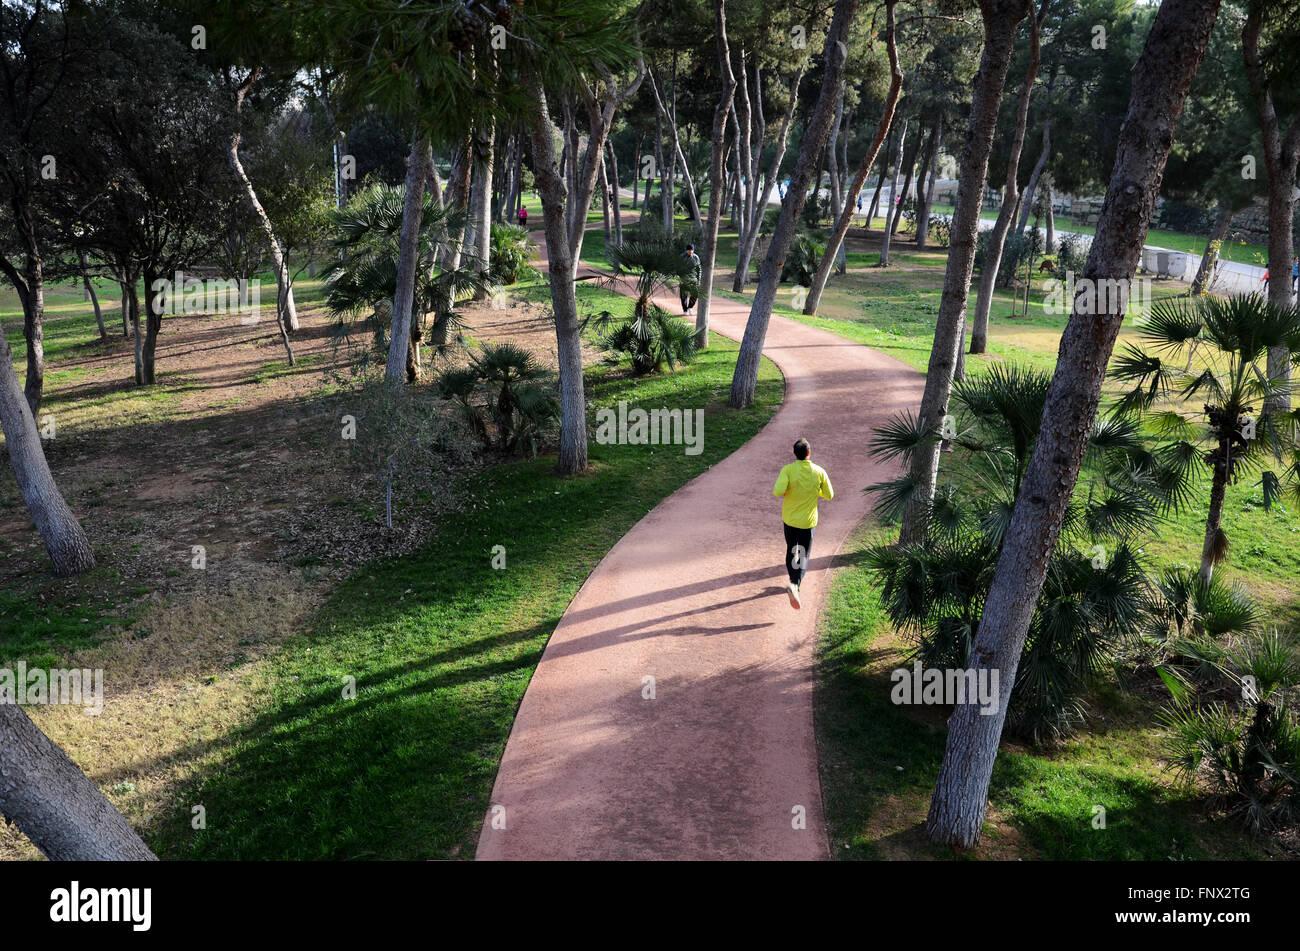 Jogging in jardin del turia valencia spain stock photo 99532624 alamy - Jardin del turia valencia ...